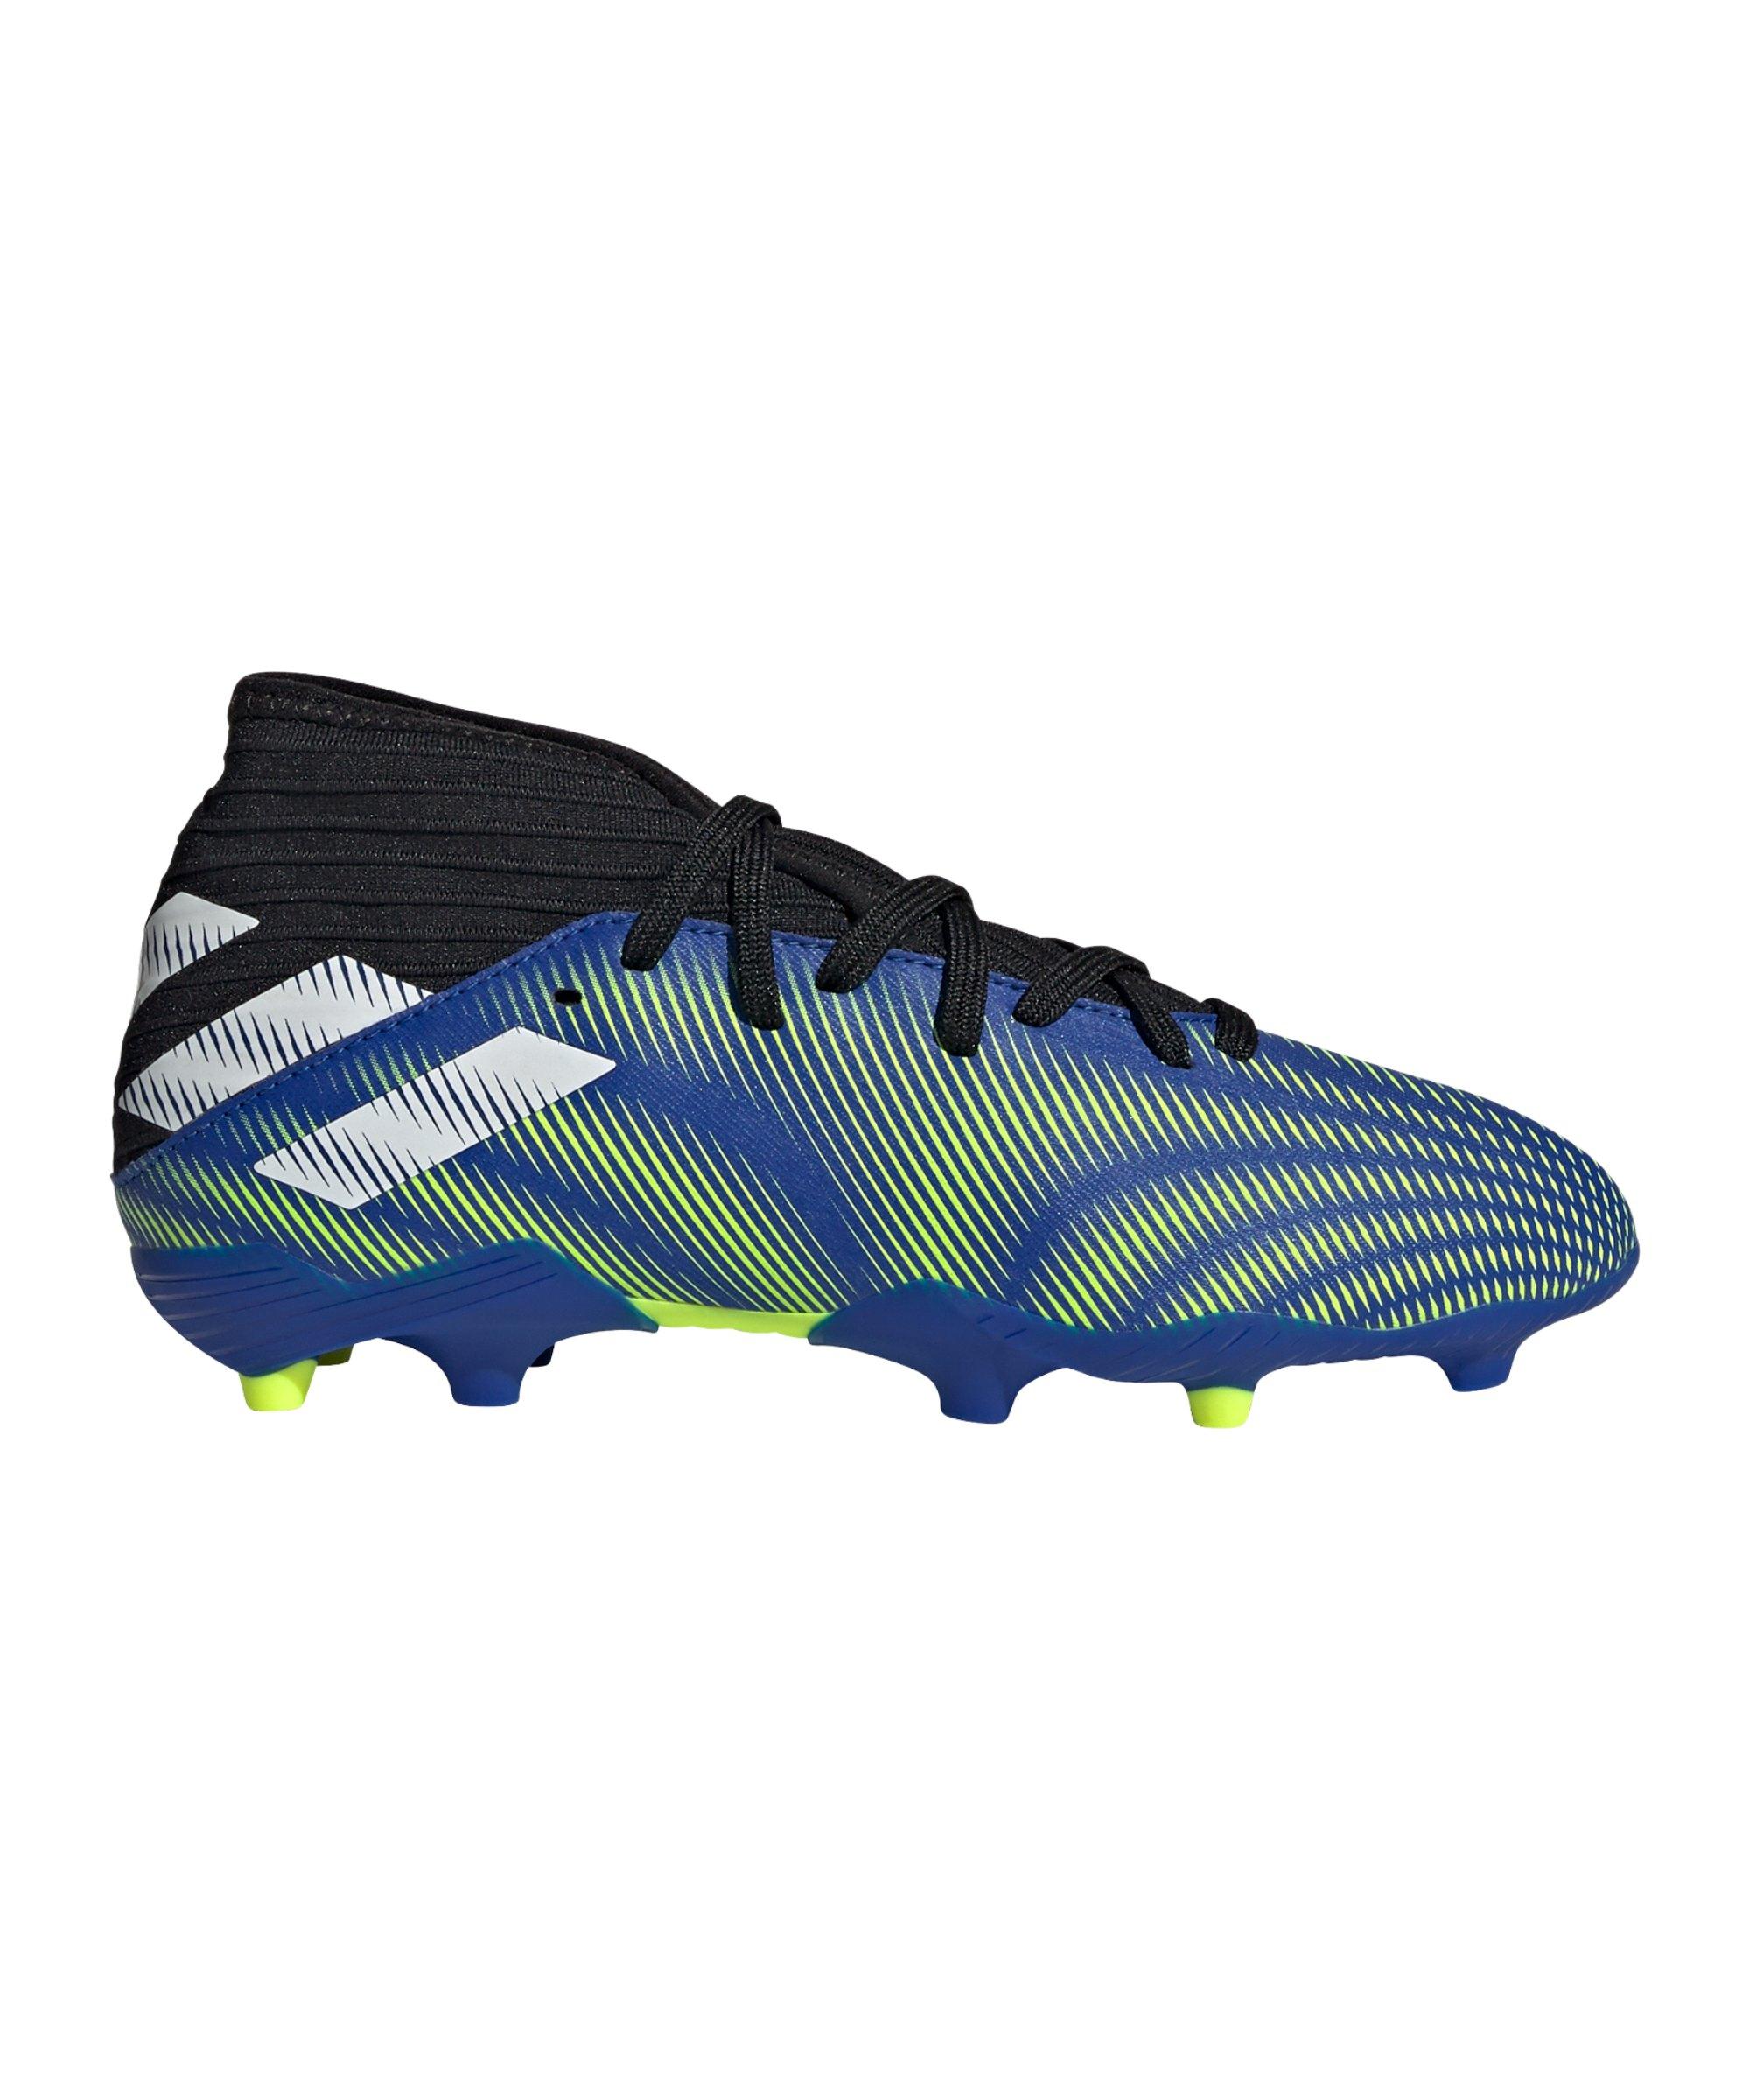 adidas NEMEZIZ.3 FG Superlative J Kids Blau Weiss - blau